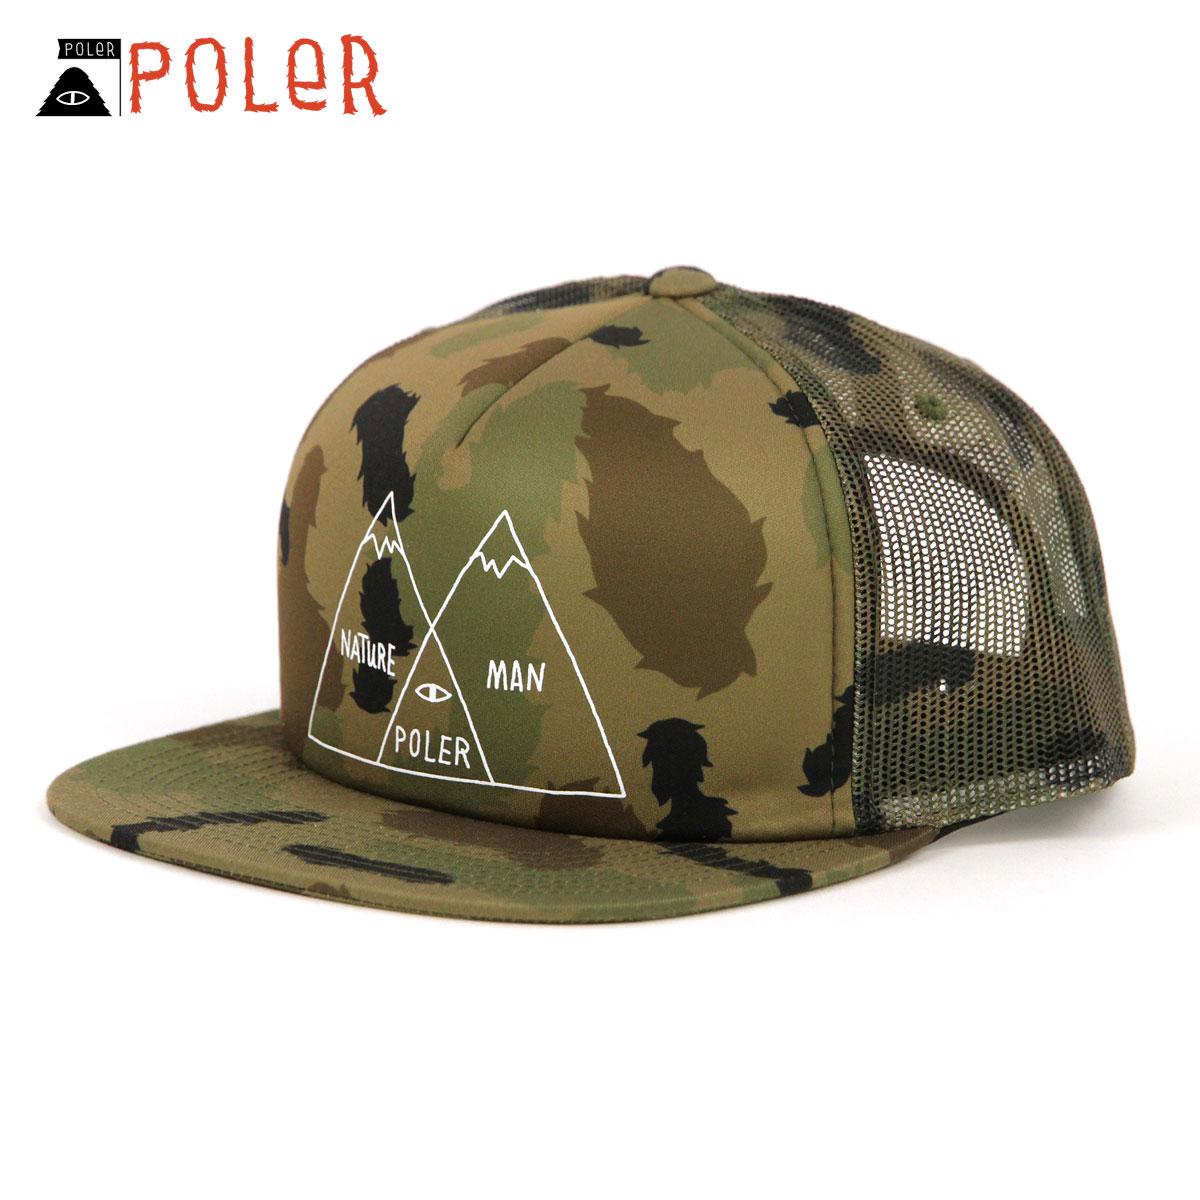 Rakuten Ichiba shop MIXON  Polar POLER regular store cap hat VENN TRUCKER  HAT 31750004-OCO OLIVE FURRY CAMO  fa2a4b6dd96